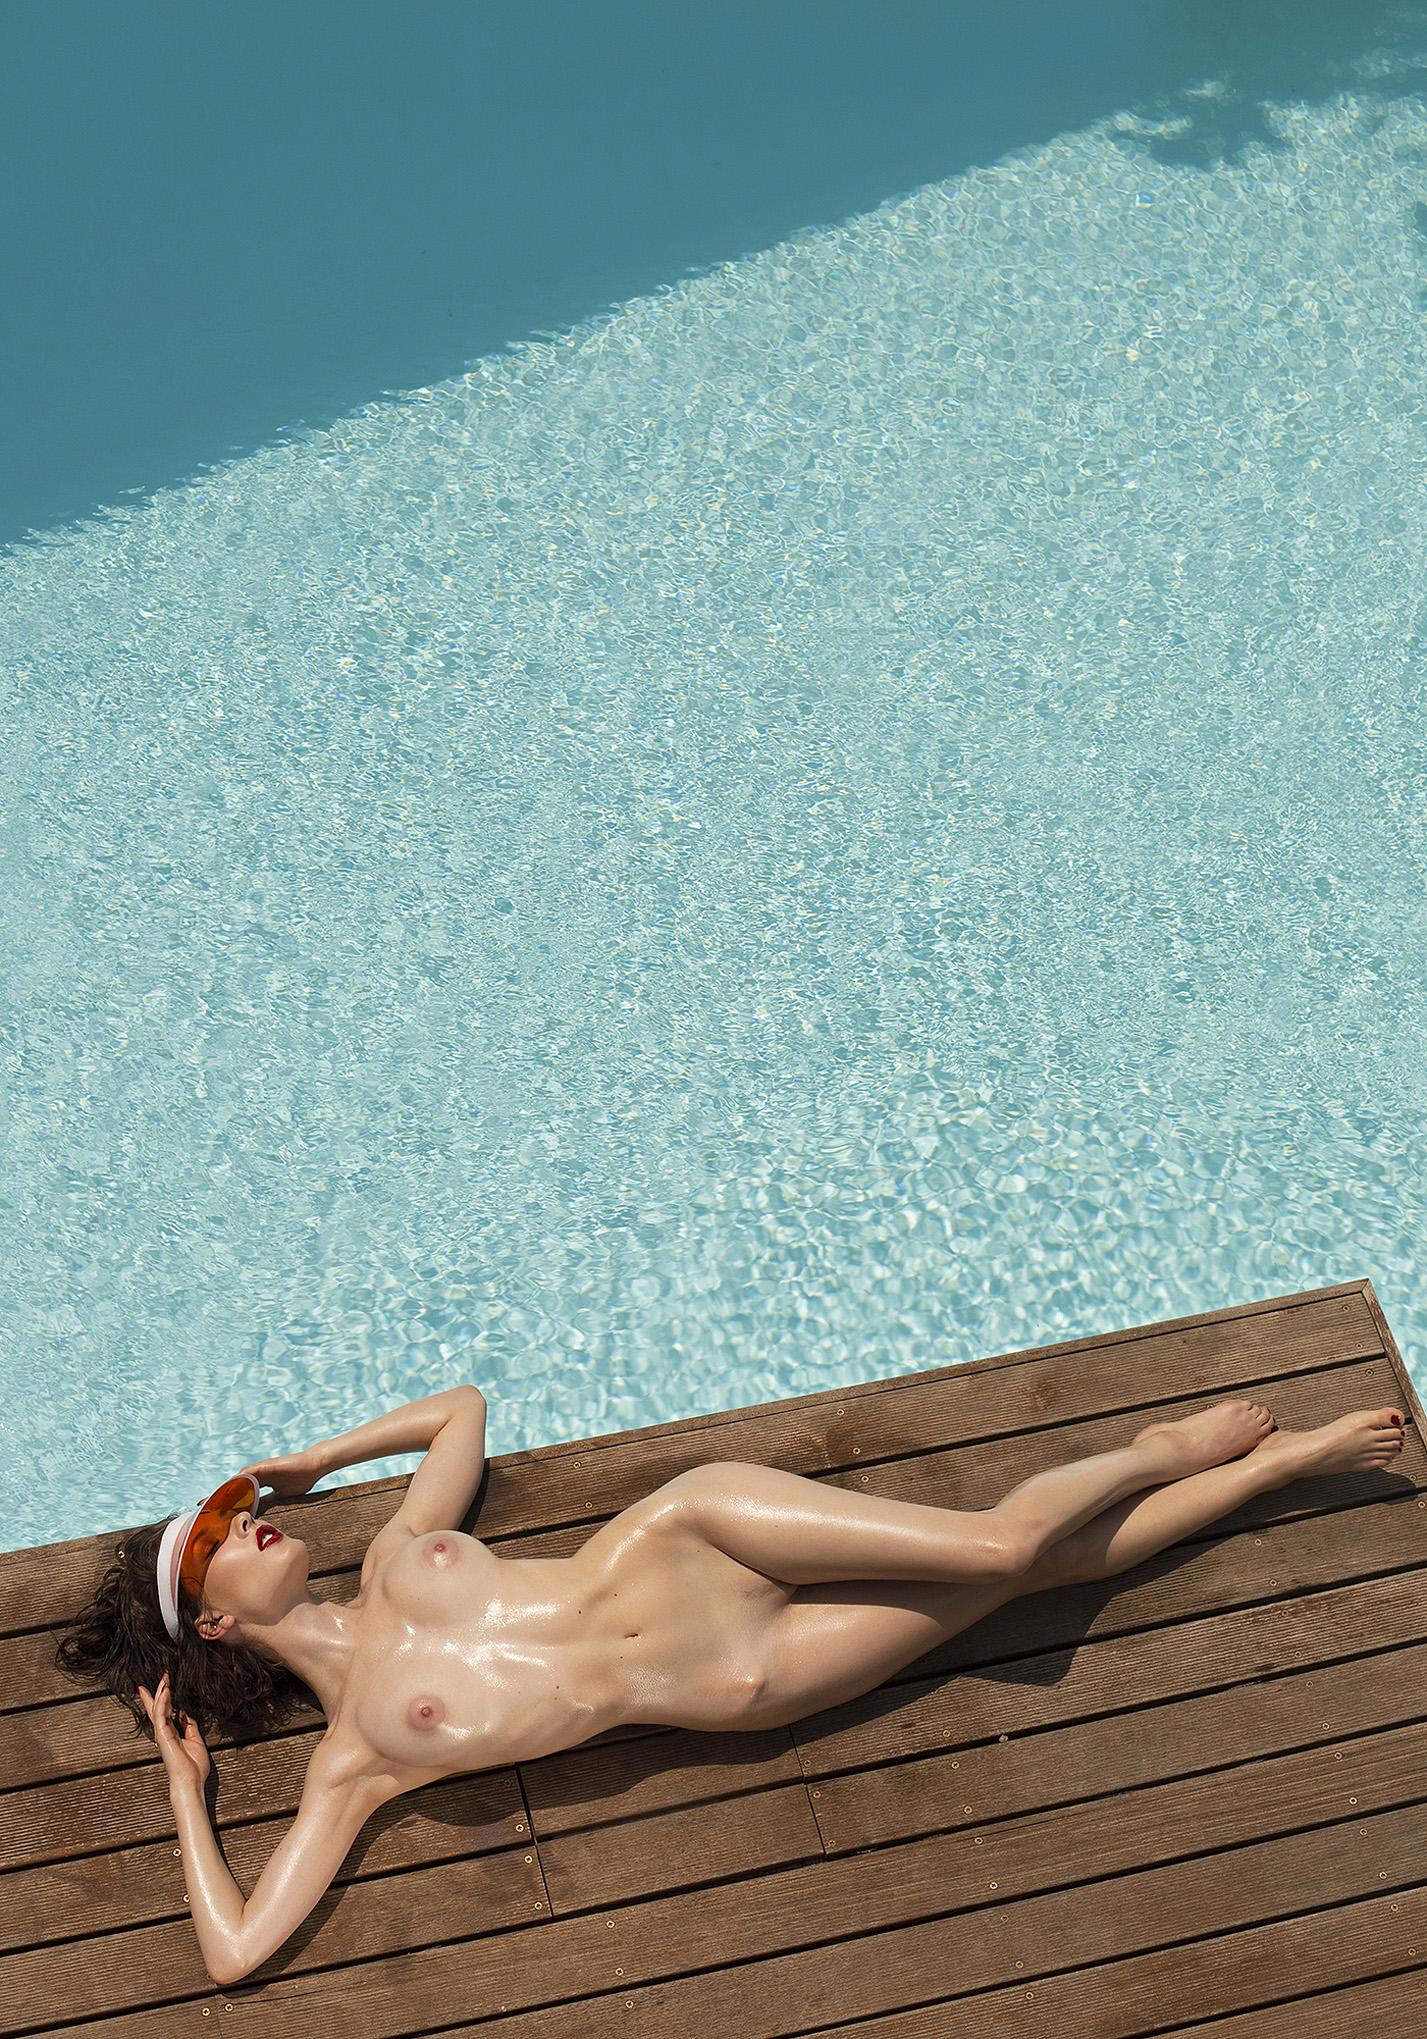 Playboy international Playmate Caprice Castillo nude by Ana Dias